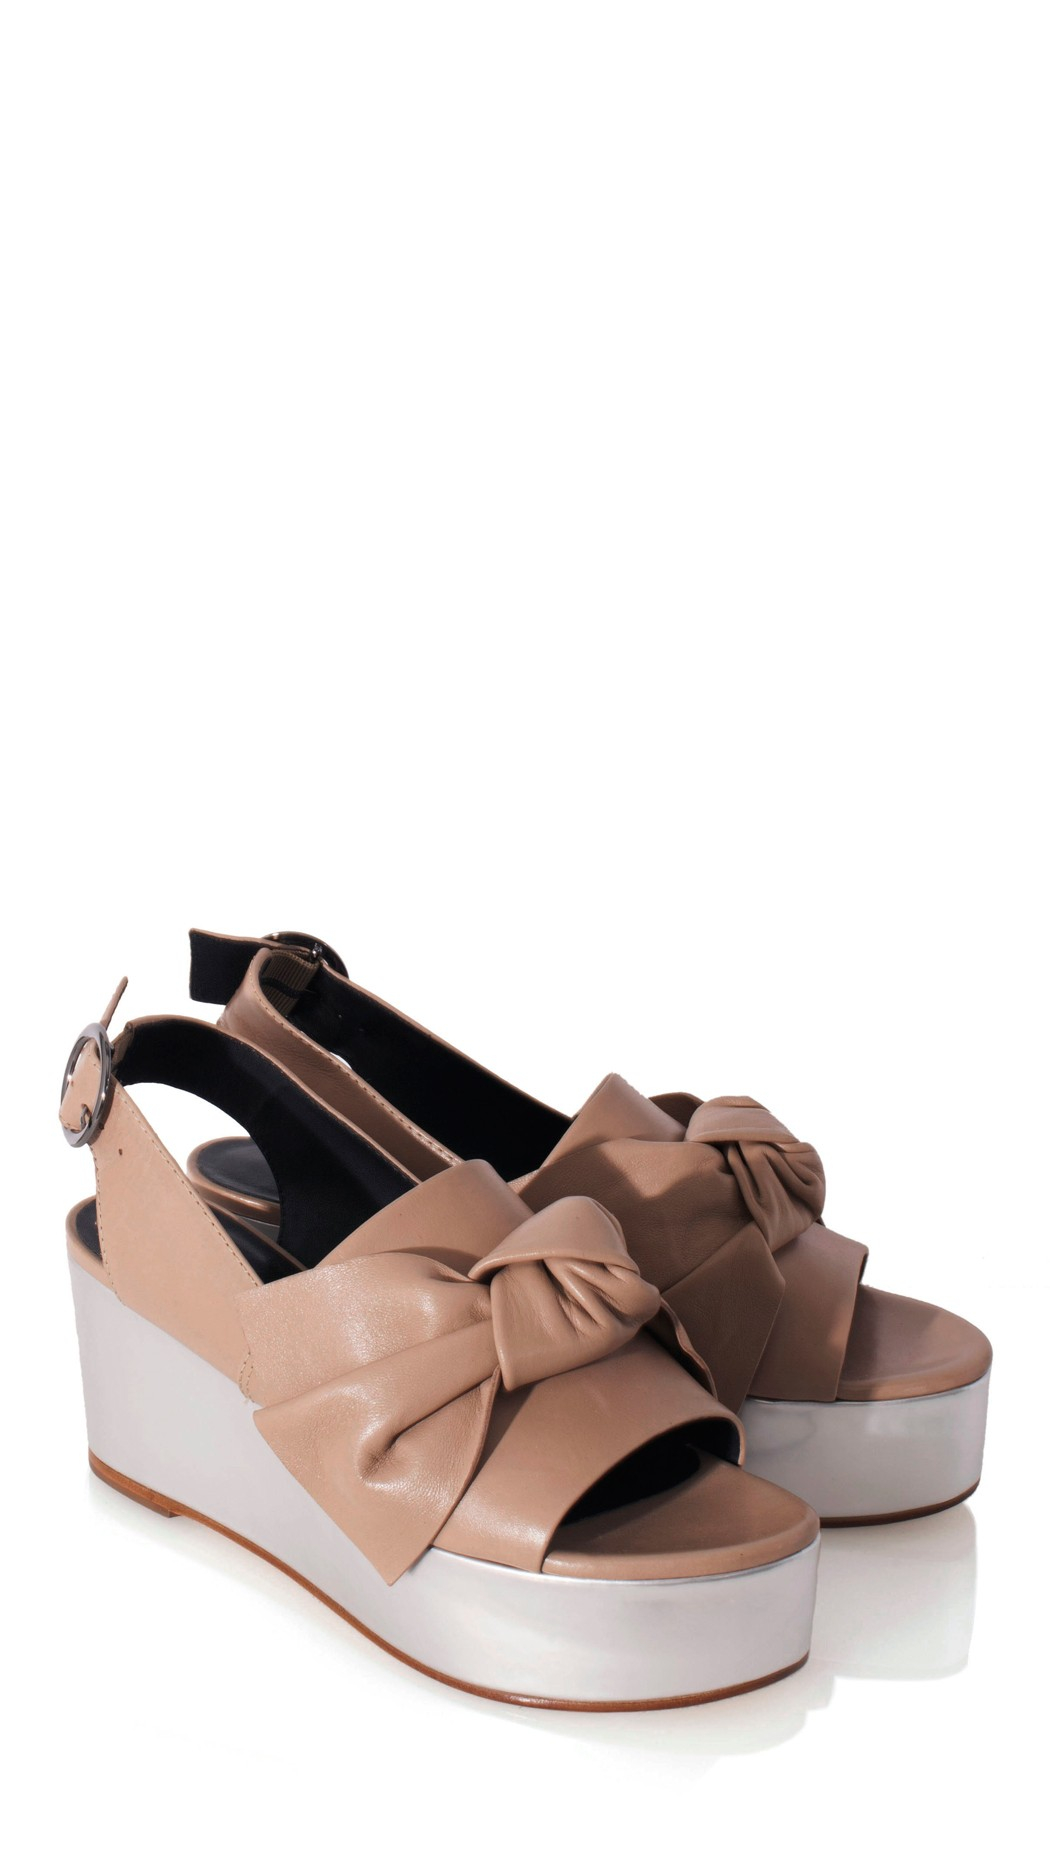 c0367dfe173 Lyst - Tibi Estel Leather Platform Sandals in Pink